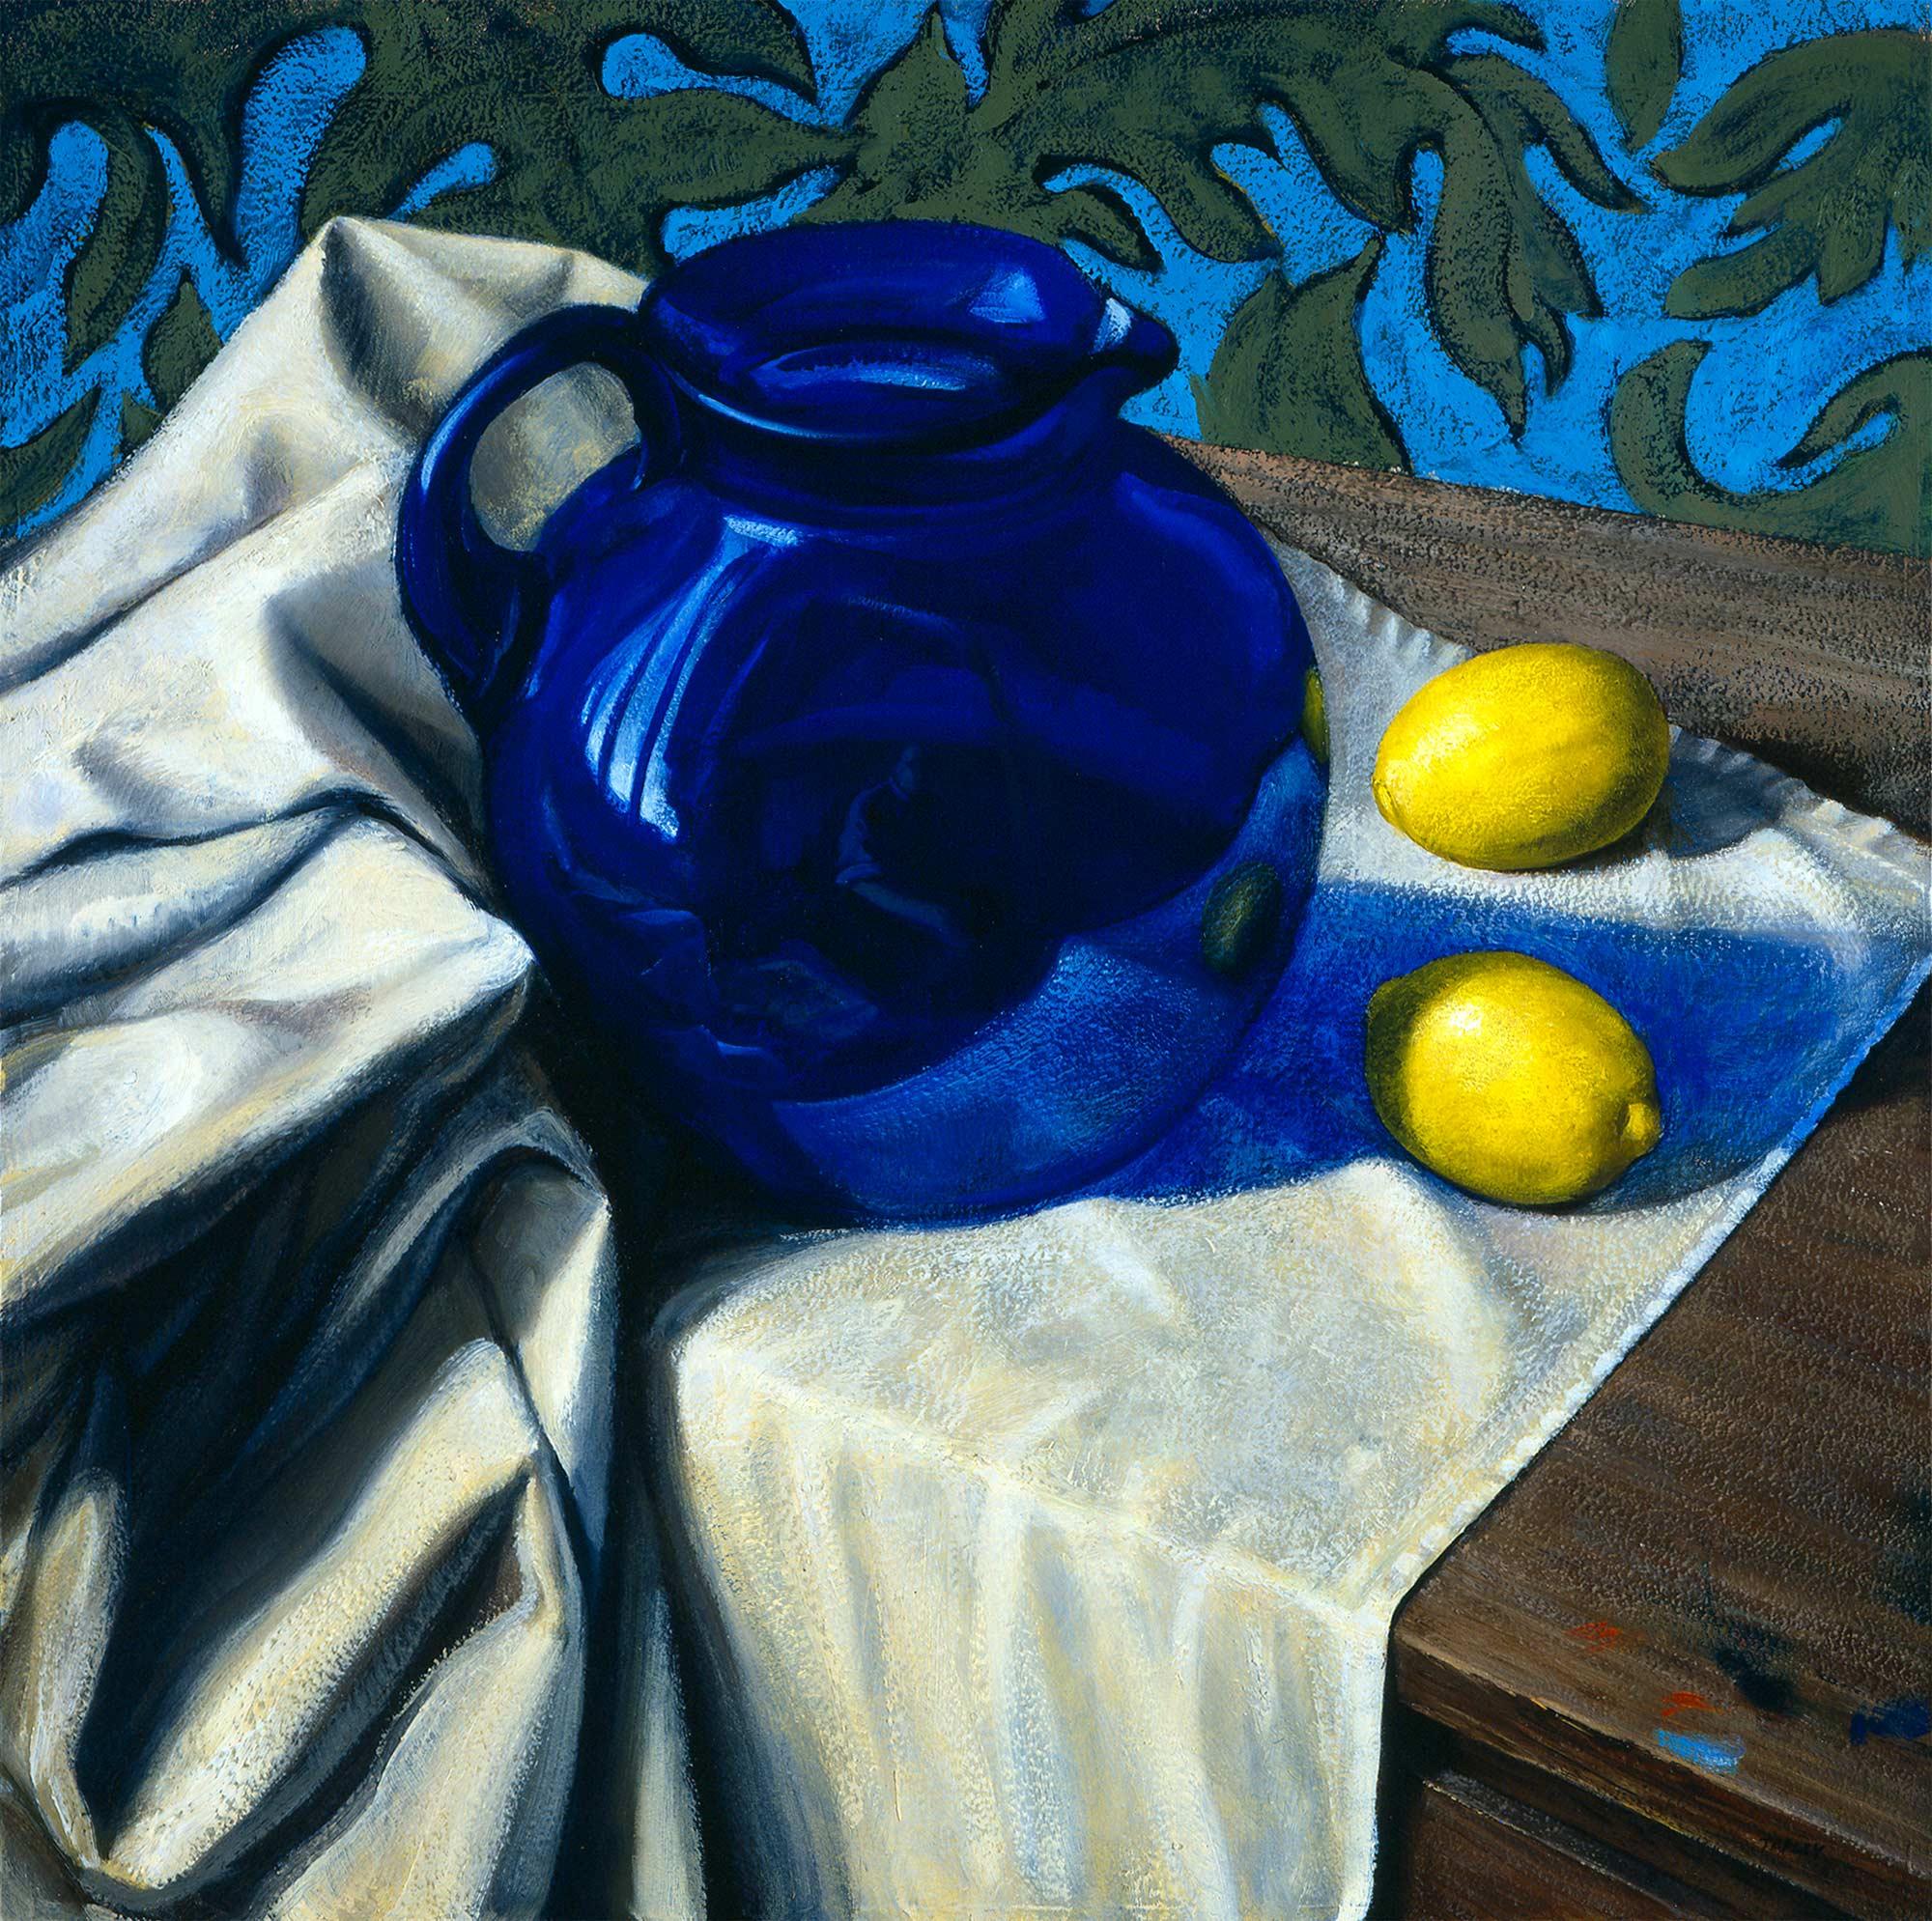 Water and Lemons